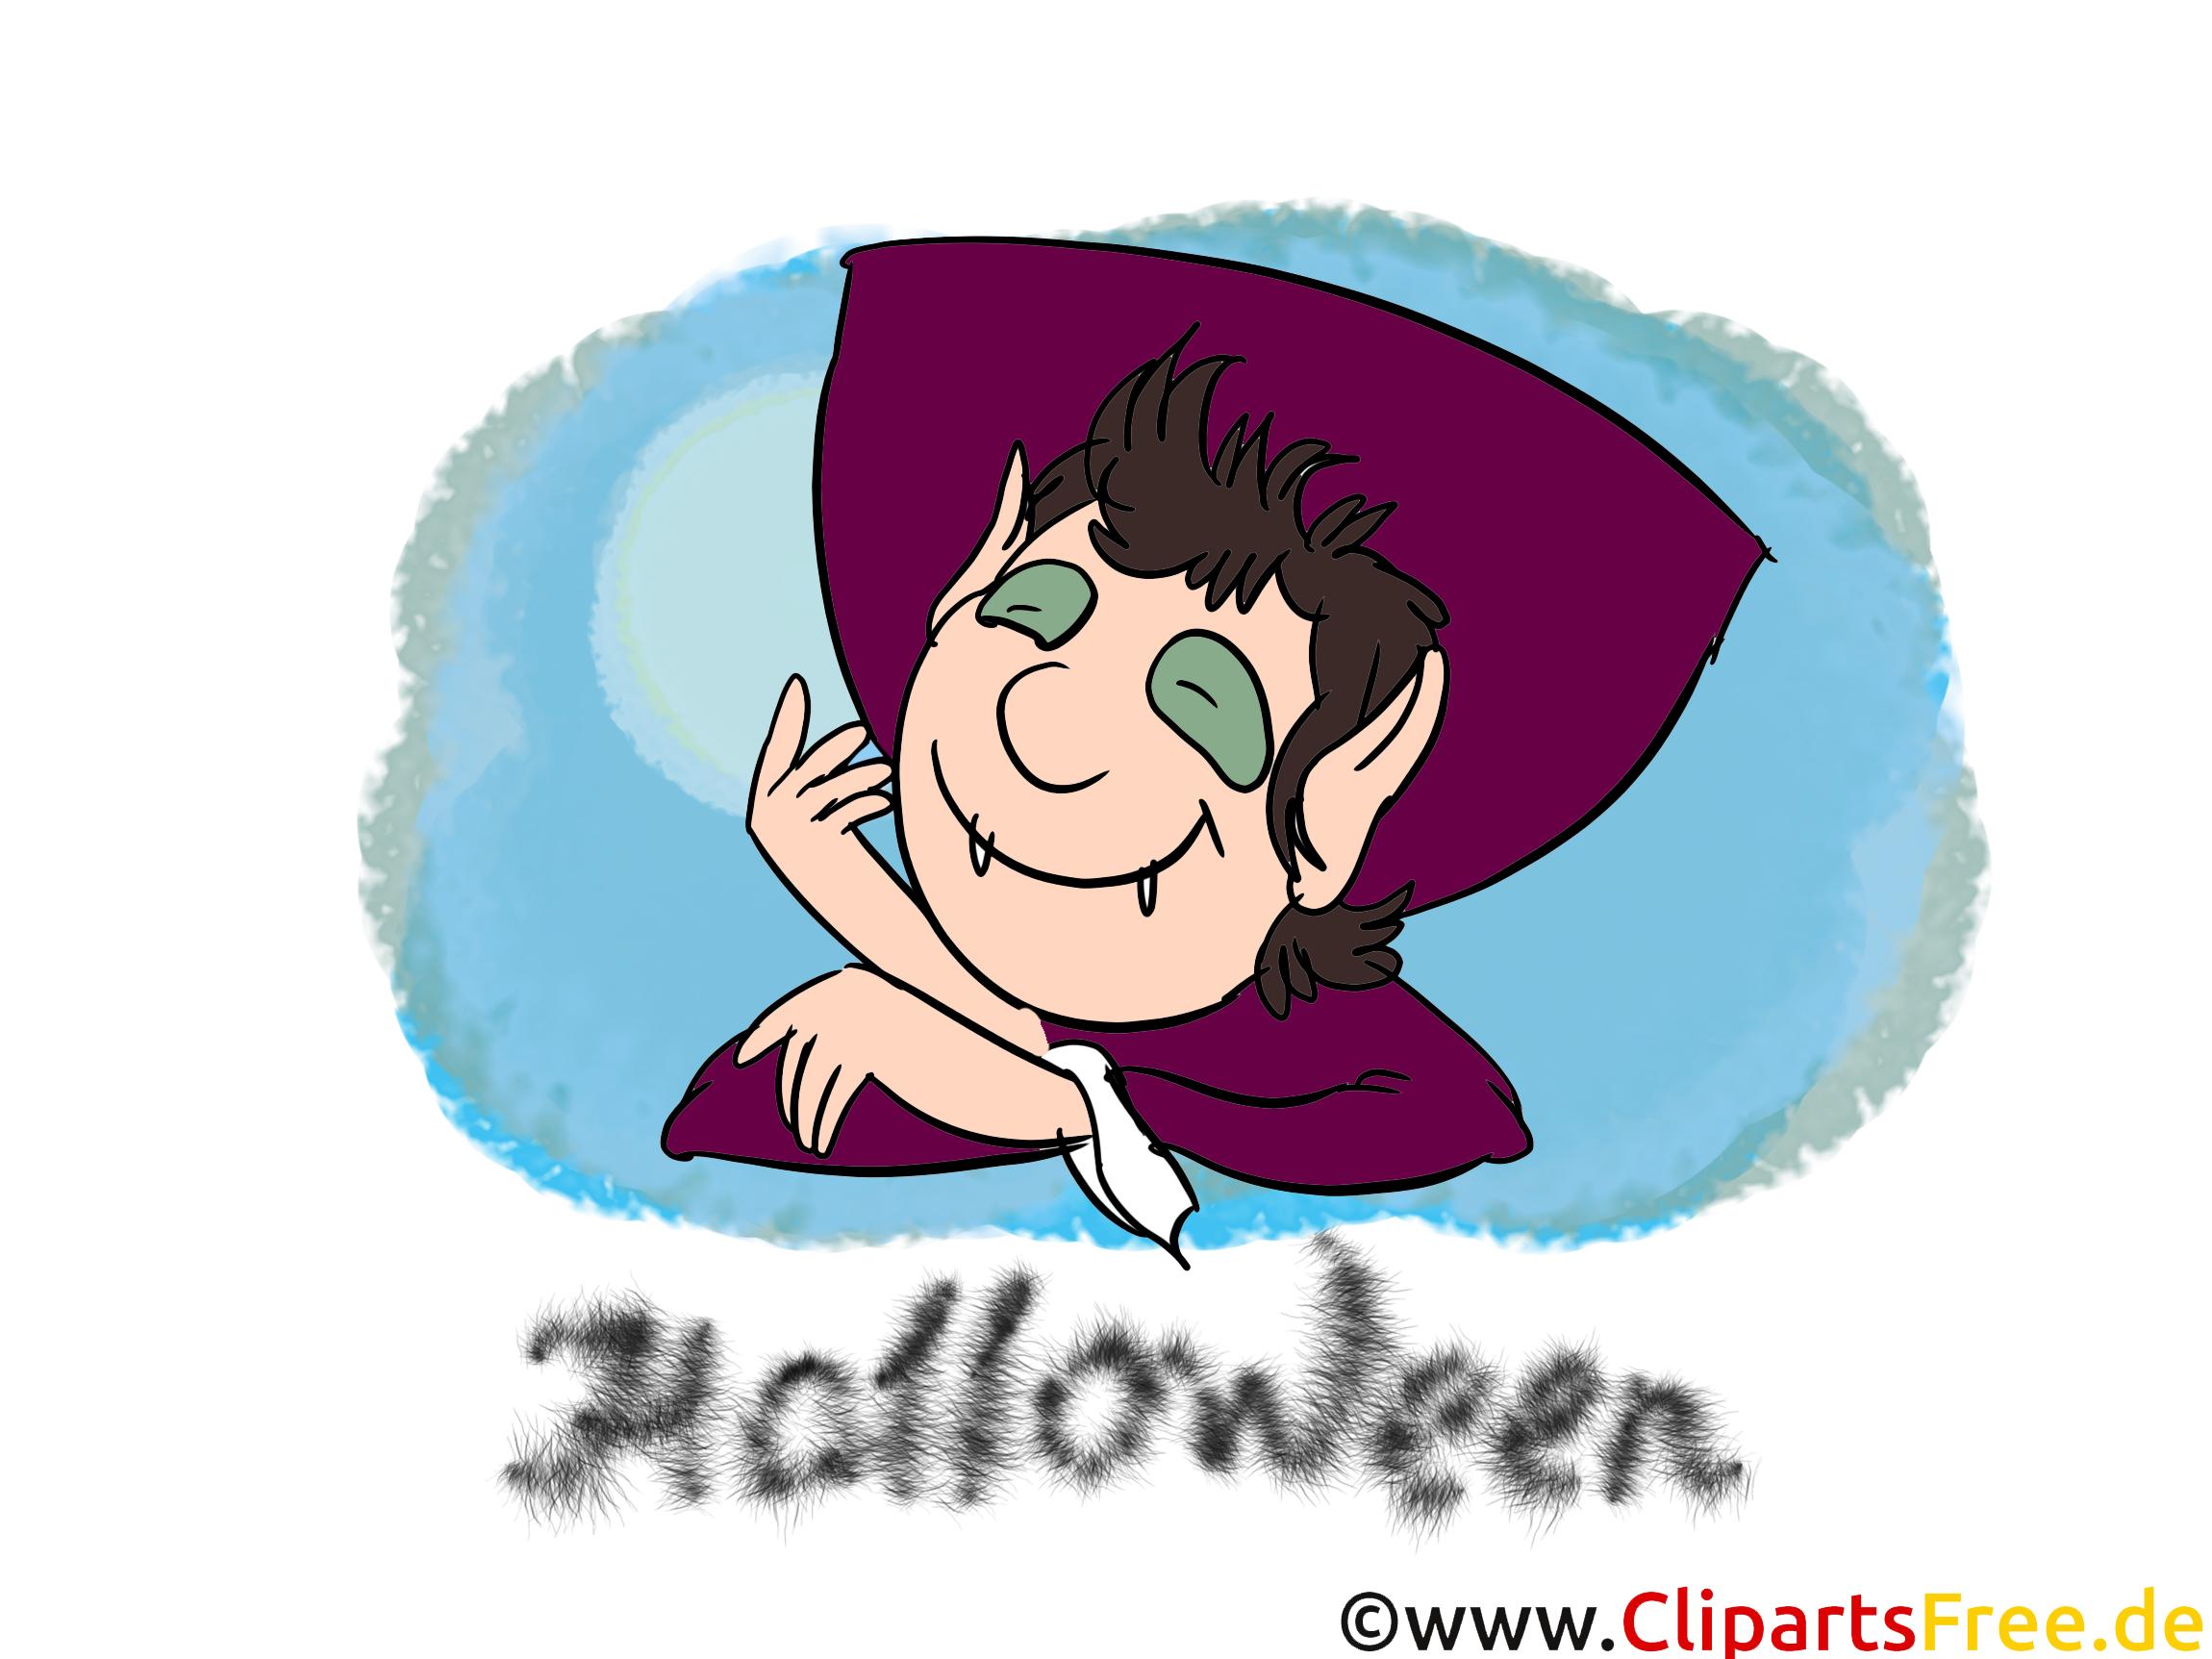 Halloween Make Up - Illustrationen, Bilder, Grafiken, Cliparts, Comics, Cartoons zu Halloween